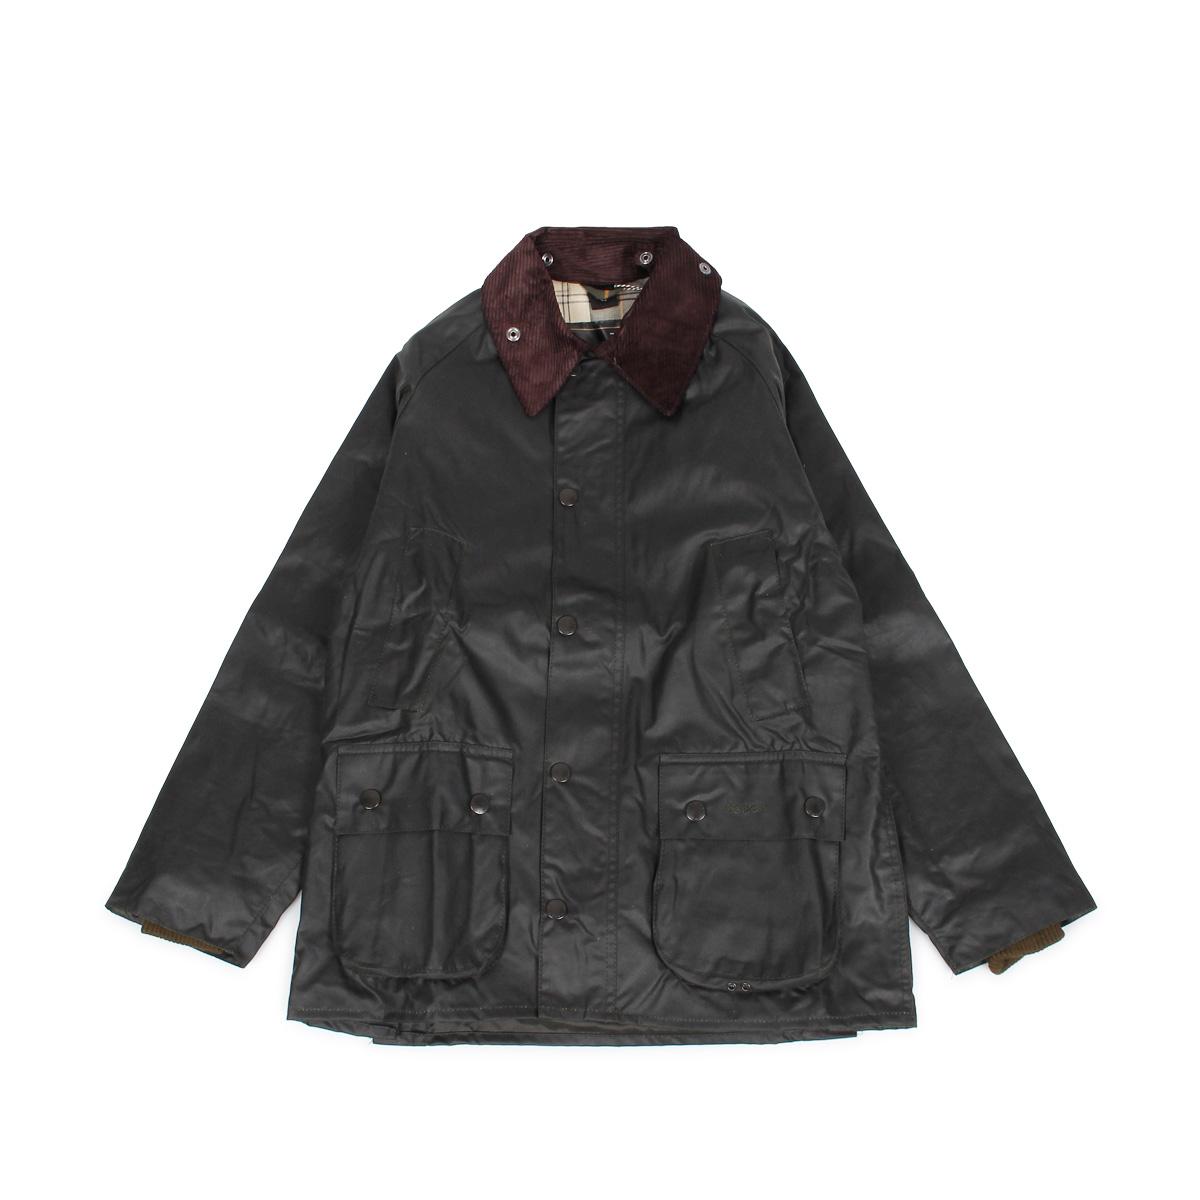 Barbour BEDALE WAX JACKET バブアー ビデイル ジャケット オイルドジャケット ワックス メンズ ブラック グリーン 黒 MWX0018